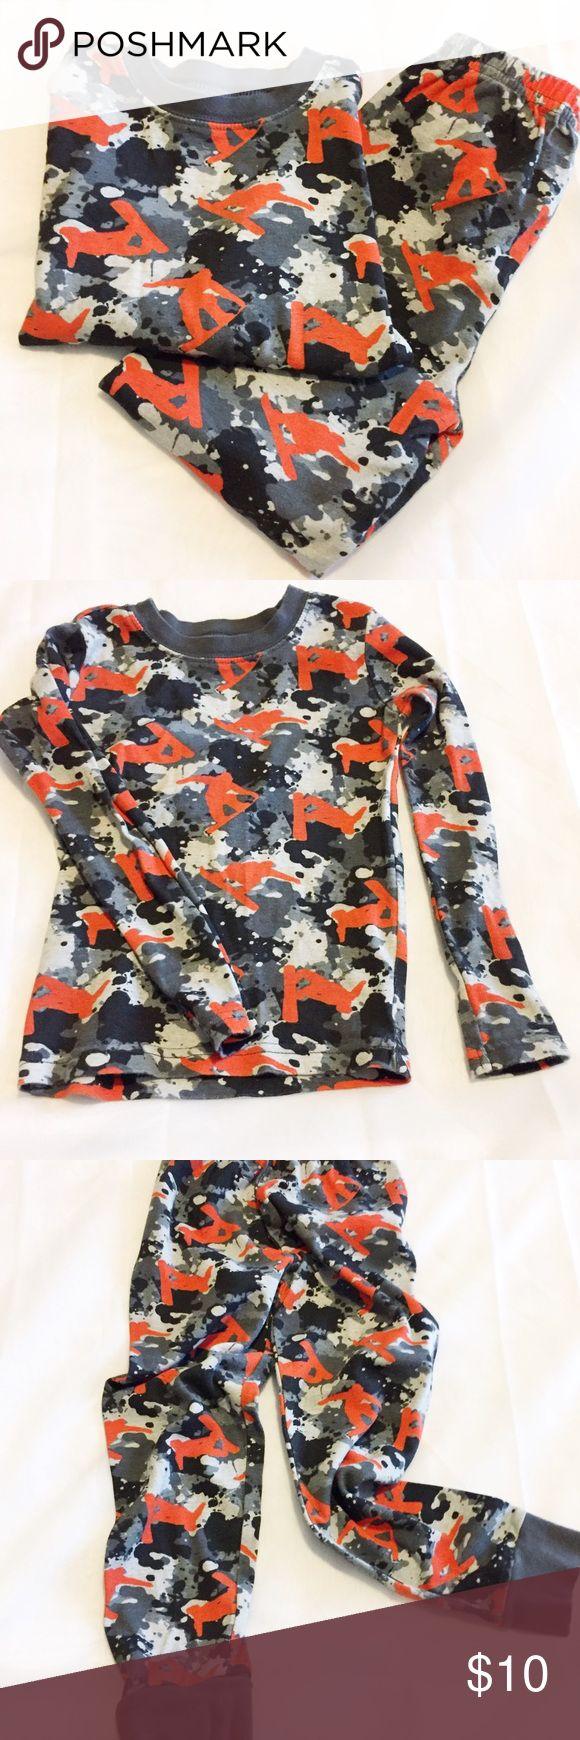 Selling this Crazy 8 | Boys' Snowboarding Pajama Set | Size 5 on Poshmark! My username is: xoshersherxo. #shopmycloset #poshmark #fashion #shopping #style #forsale #Crazy 8 #Other